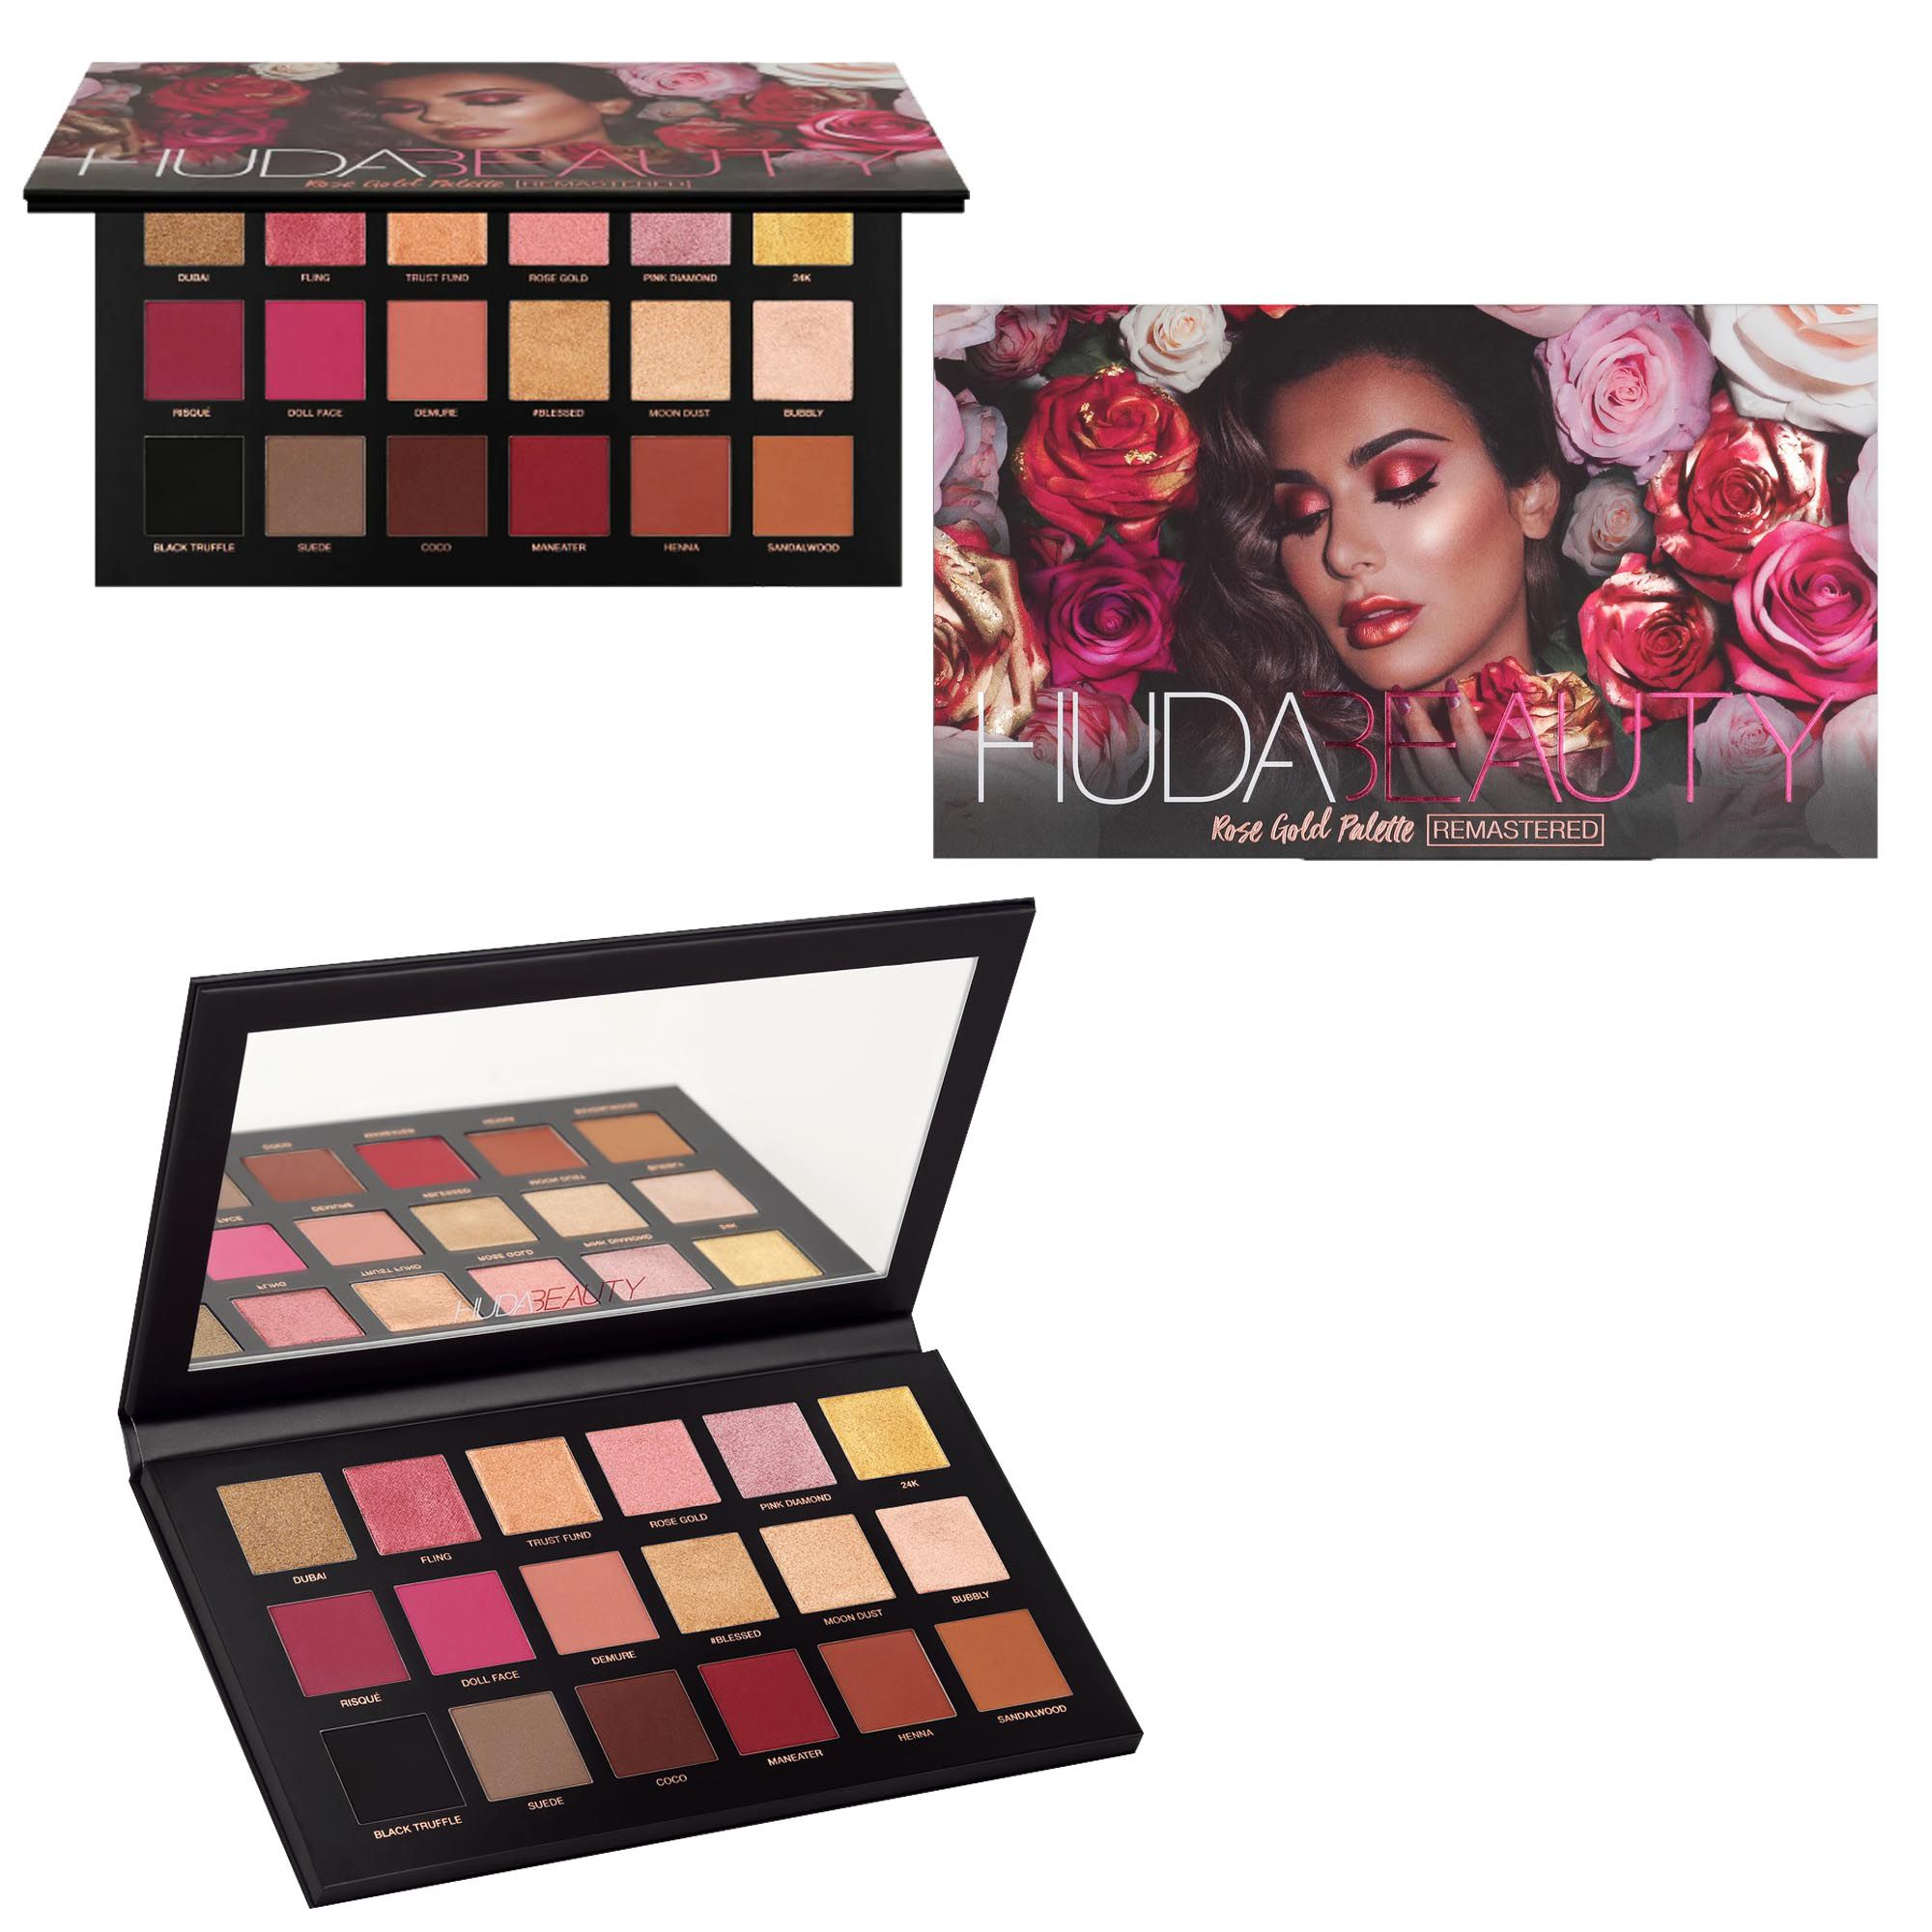 Kit de Maquiagem Paletas de Sombra Hud Beauty C/10 Pincéis + Brindes